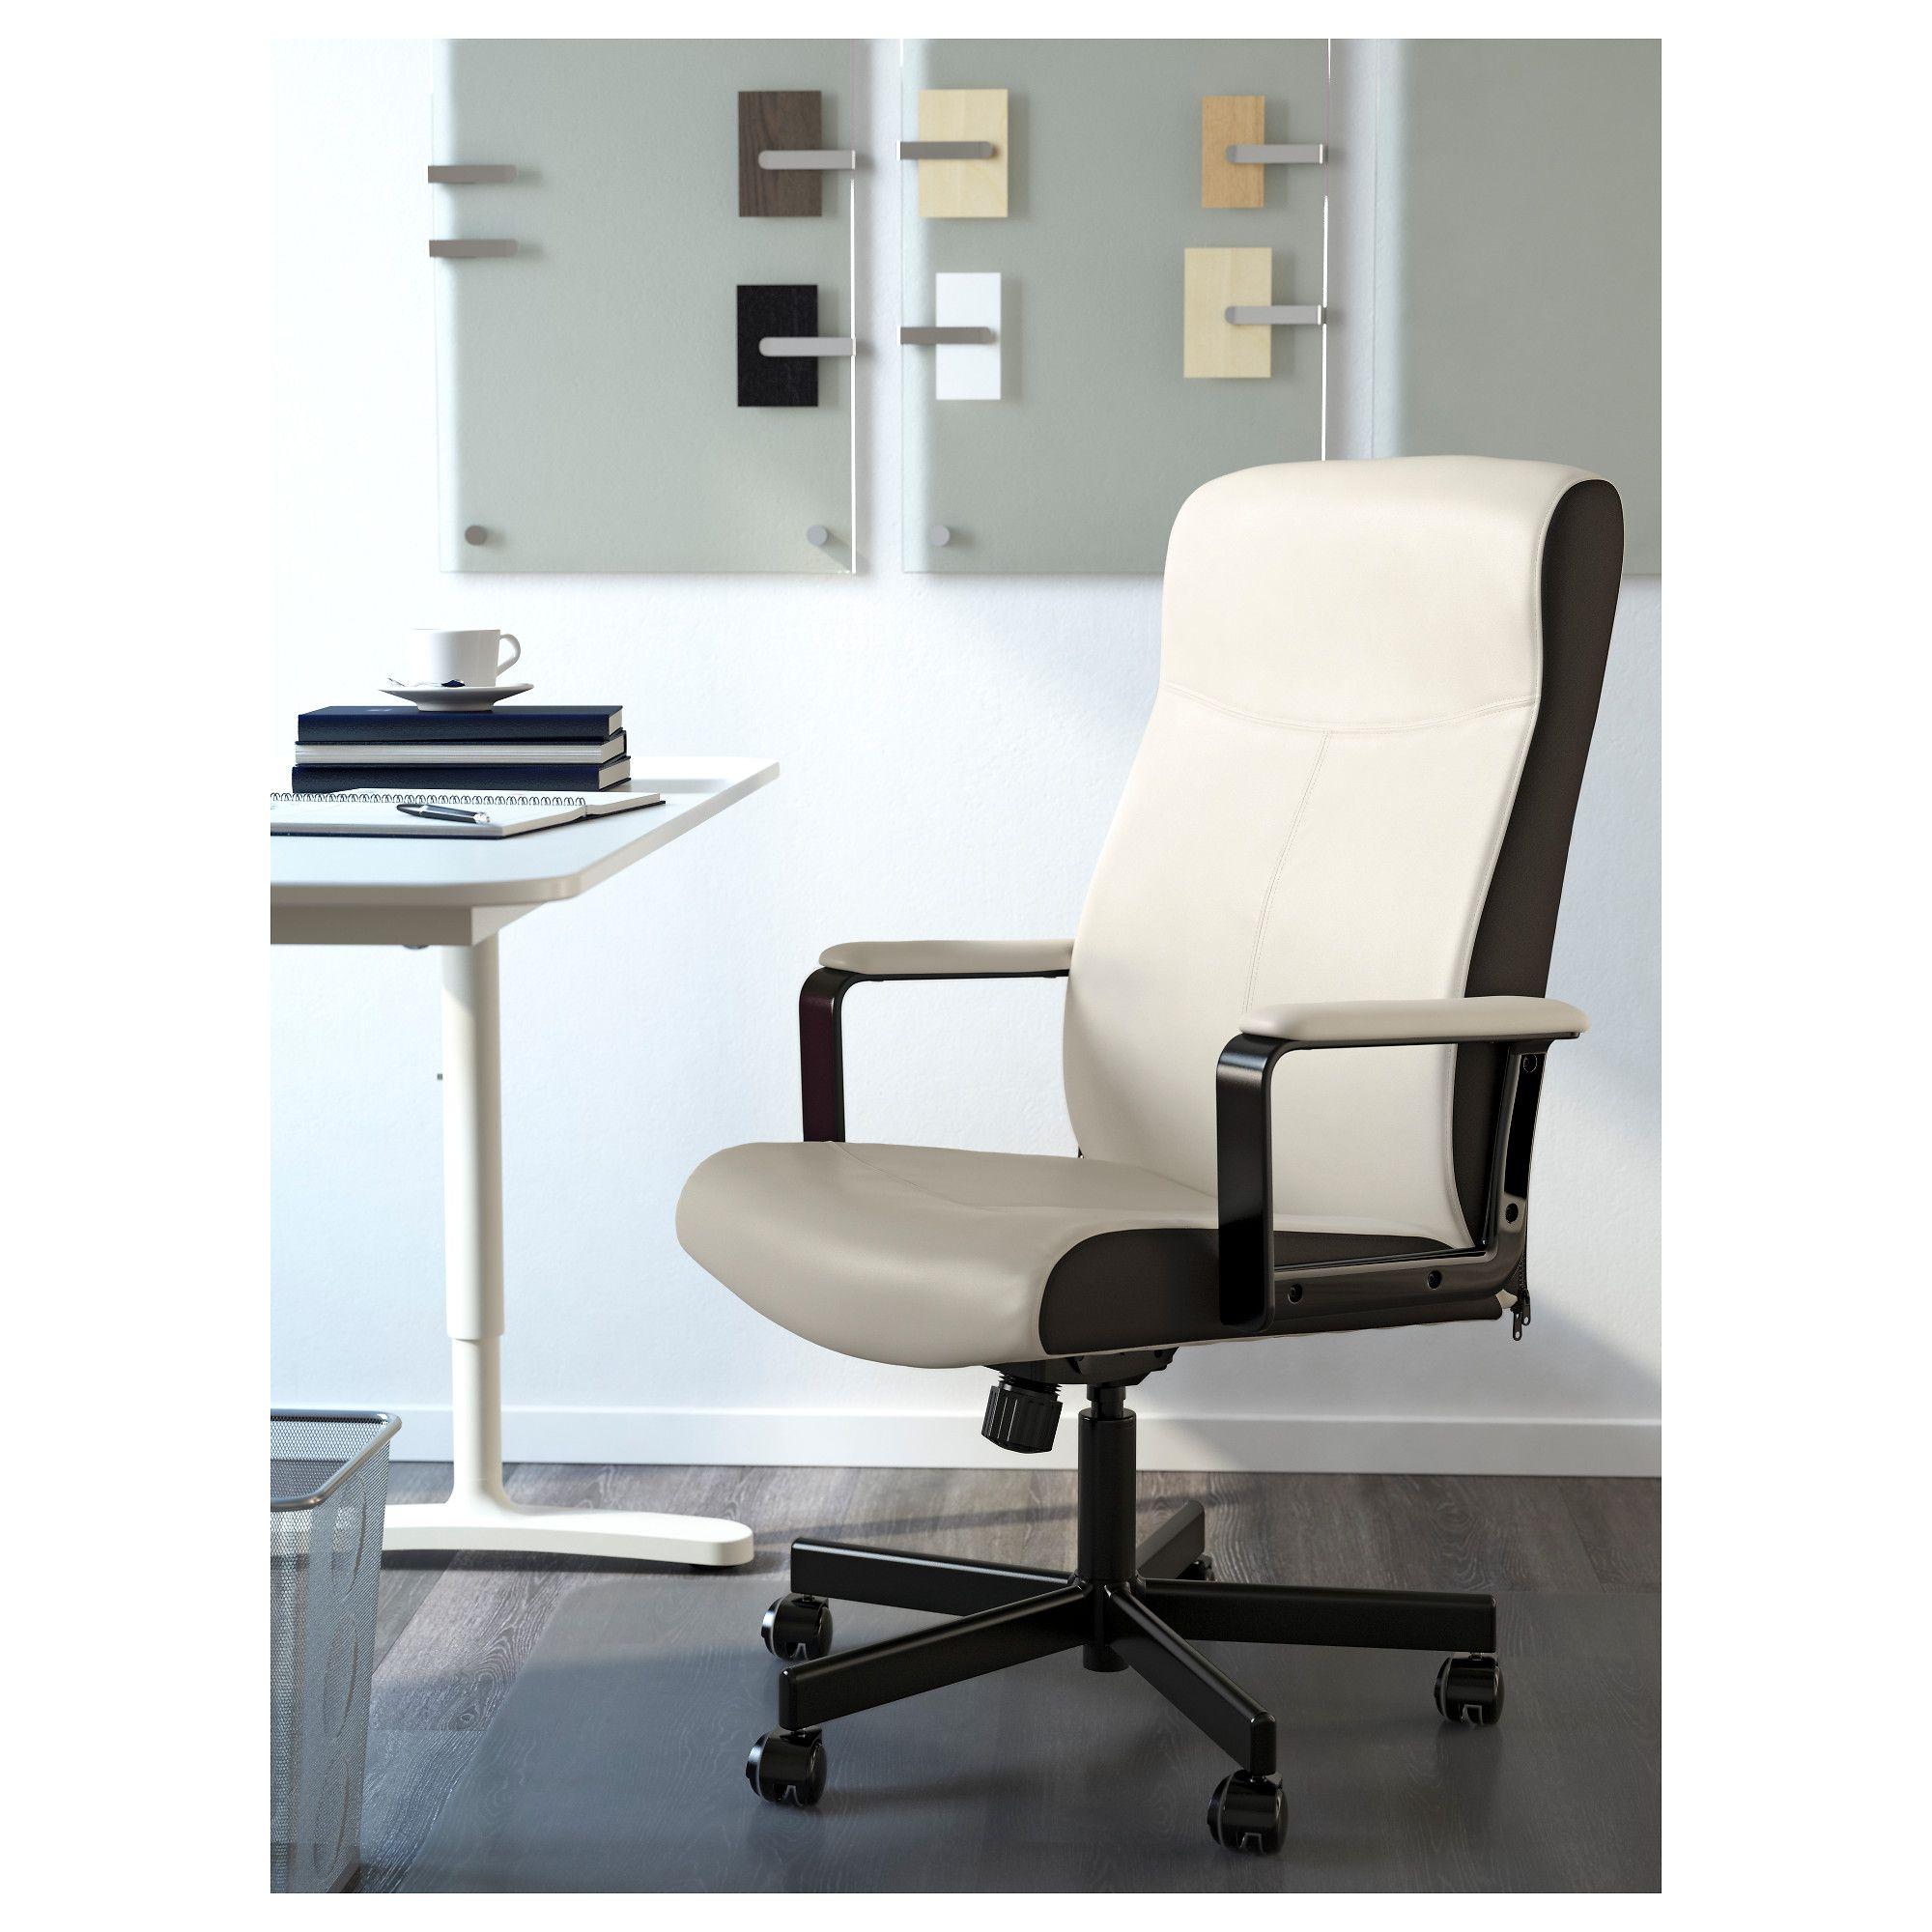 IKEA MILLBERGET Swivel chair Kimstad white Most